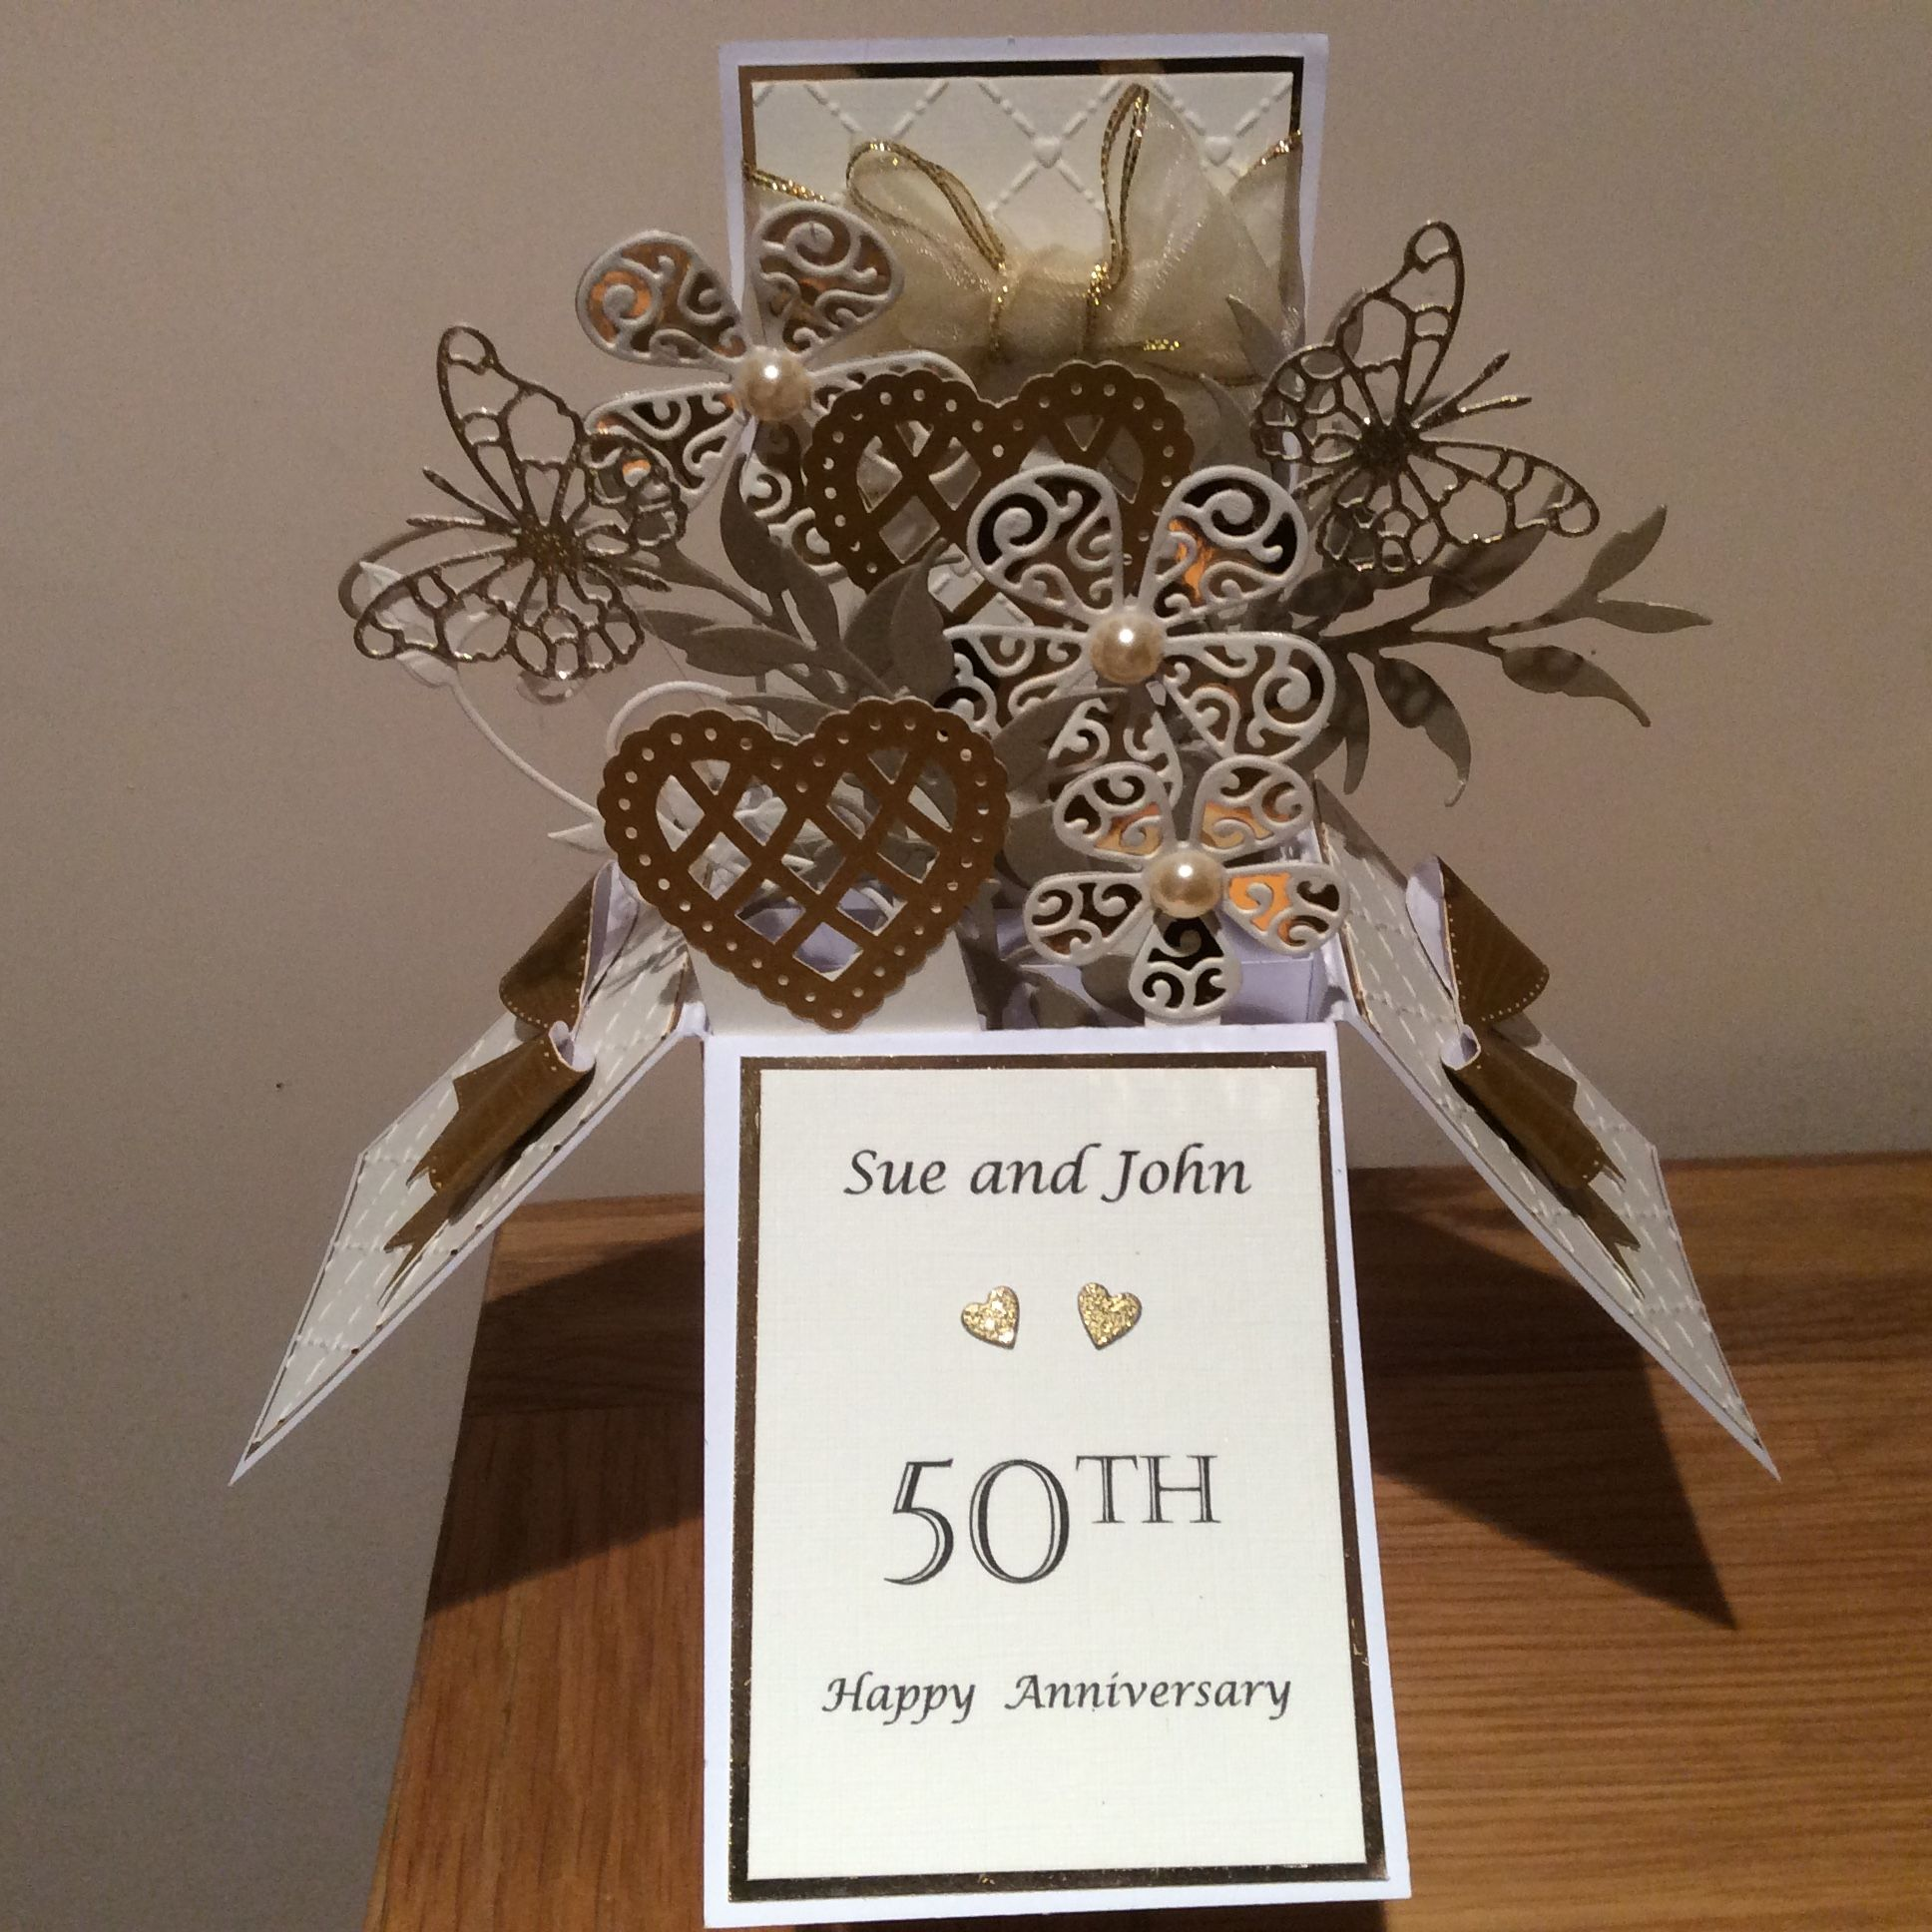 Exploding 25th Silver Wedding Anniversary Box Card Etsy 50th Wedding Anniversary Card Box Golden Wedding Anniversary Card Silver Wedding Anniversary